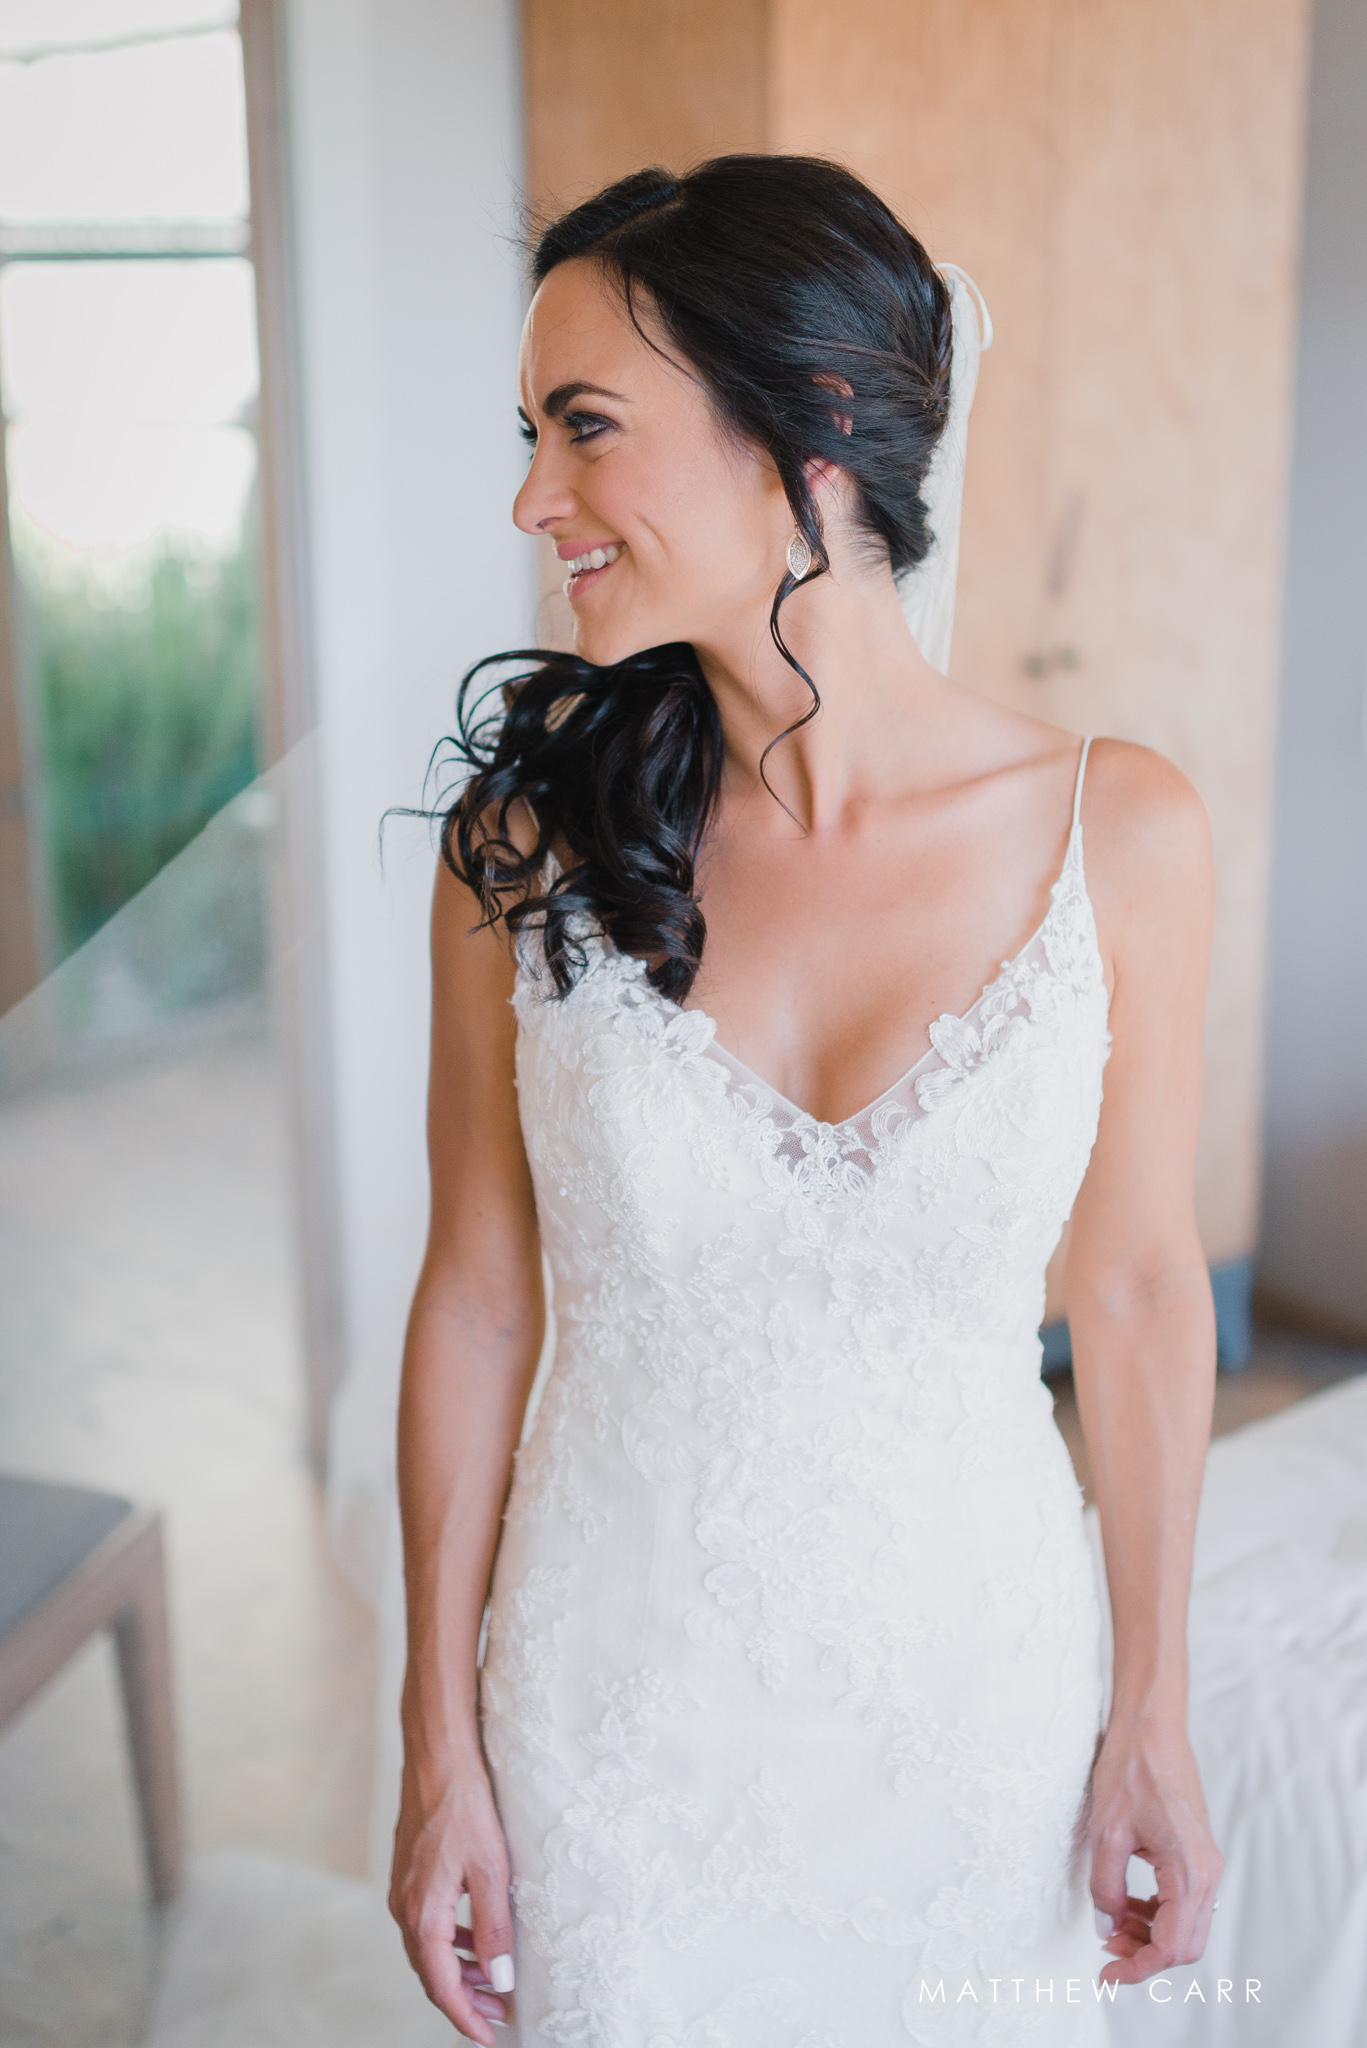 wedding prep - low res (viewing, social media) (247 of 276).JPG